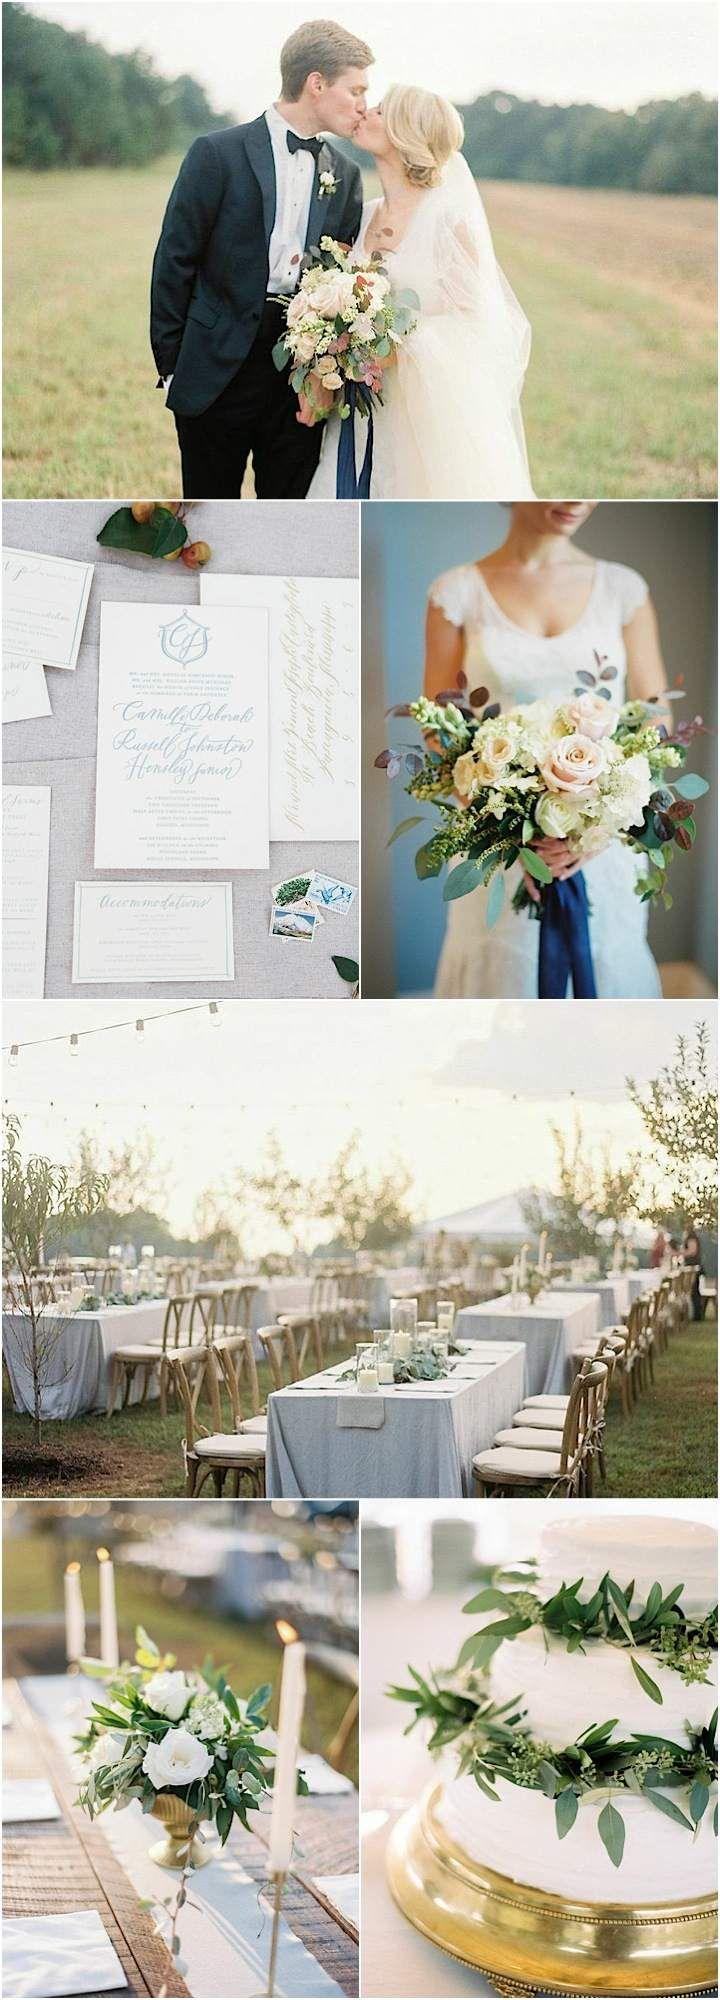 Wedding Theme Idea Photo Lauren Kinsey Wedding Ideas Pinterest